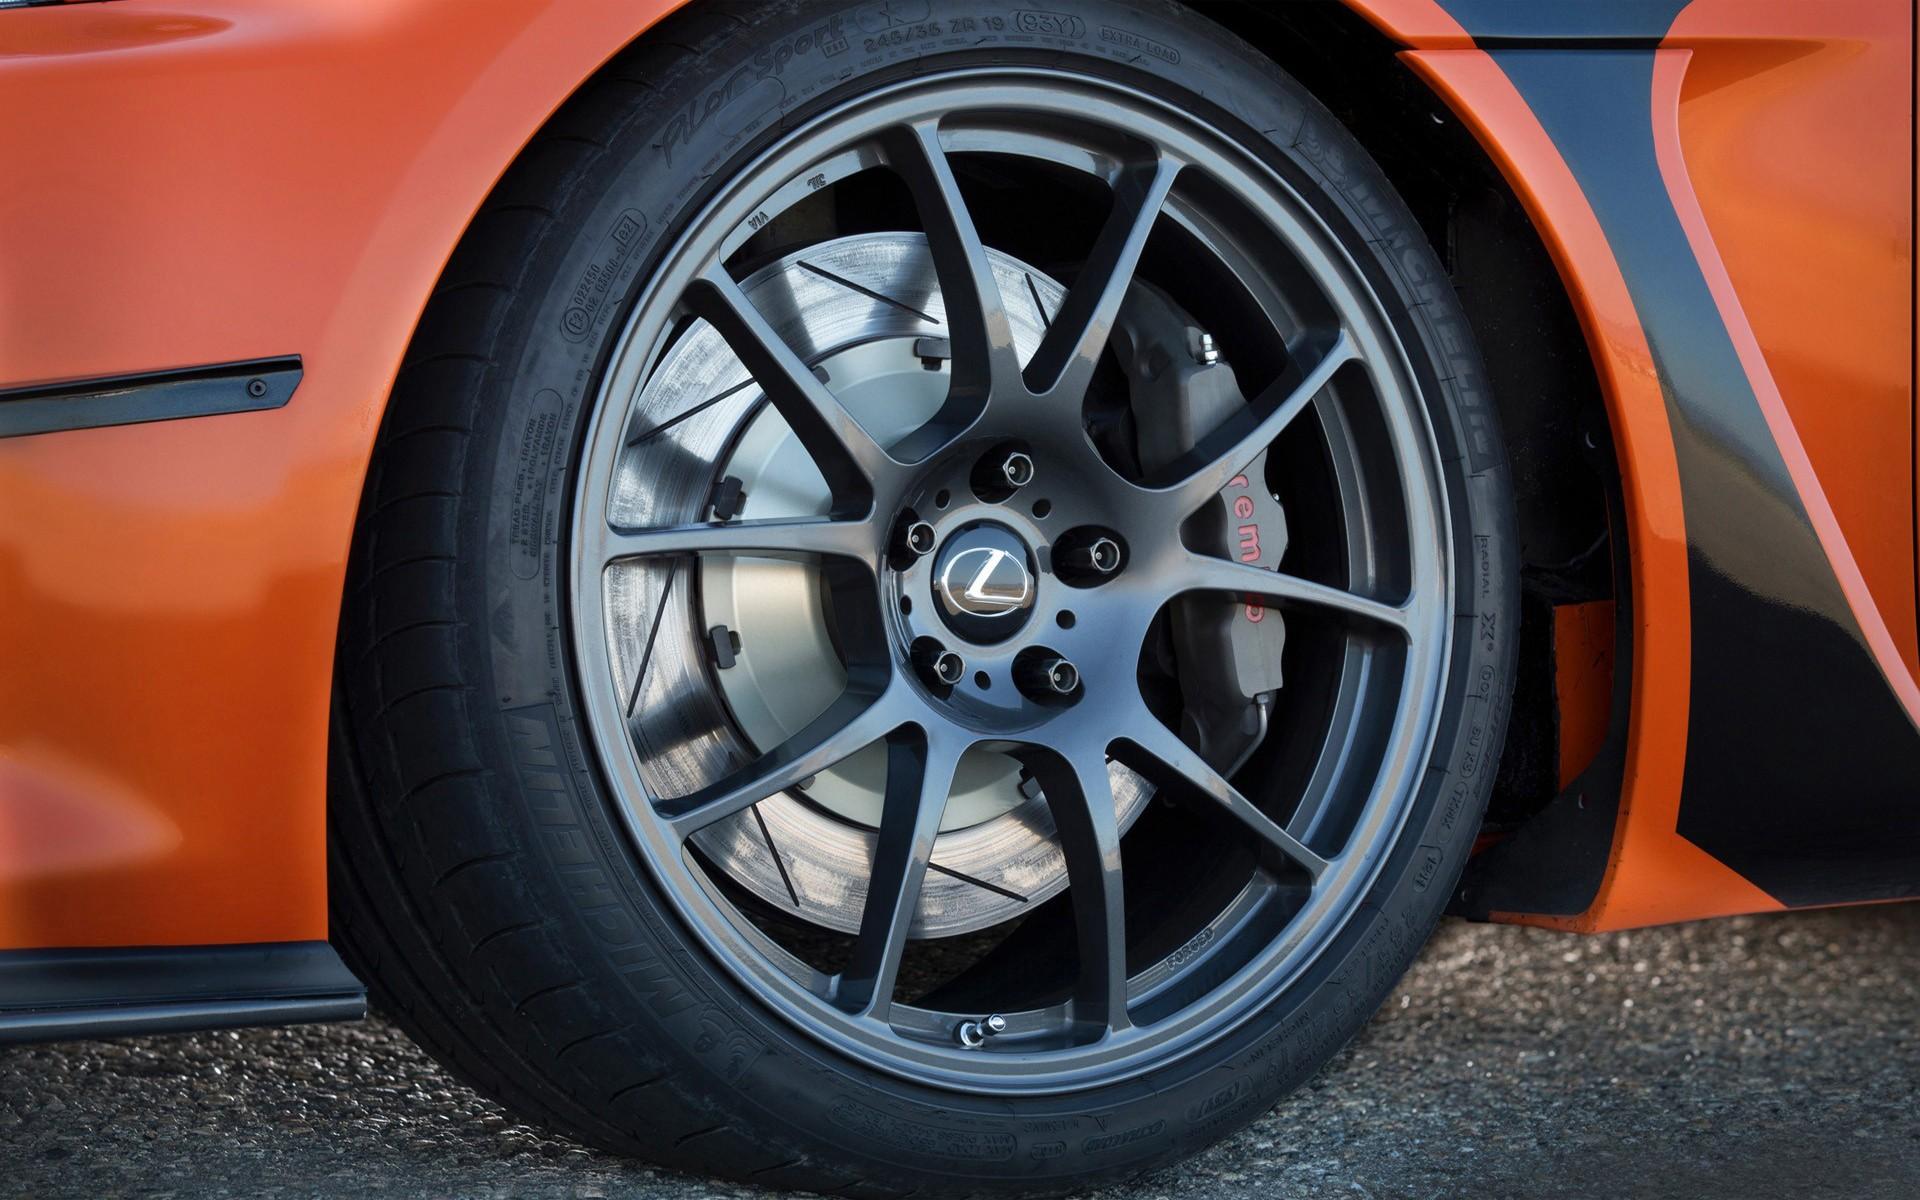 Aros de auto lexus - 1920x1200